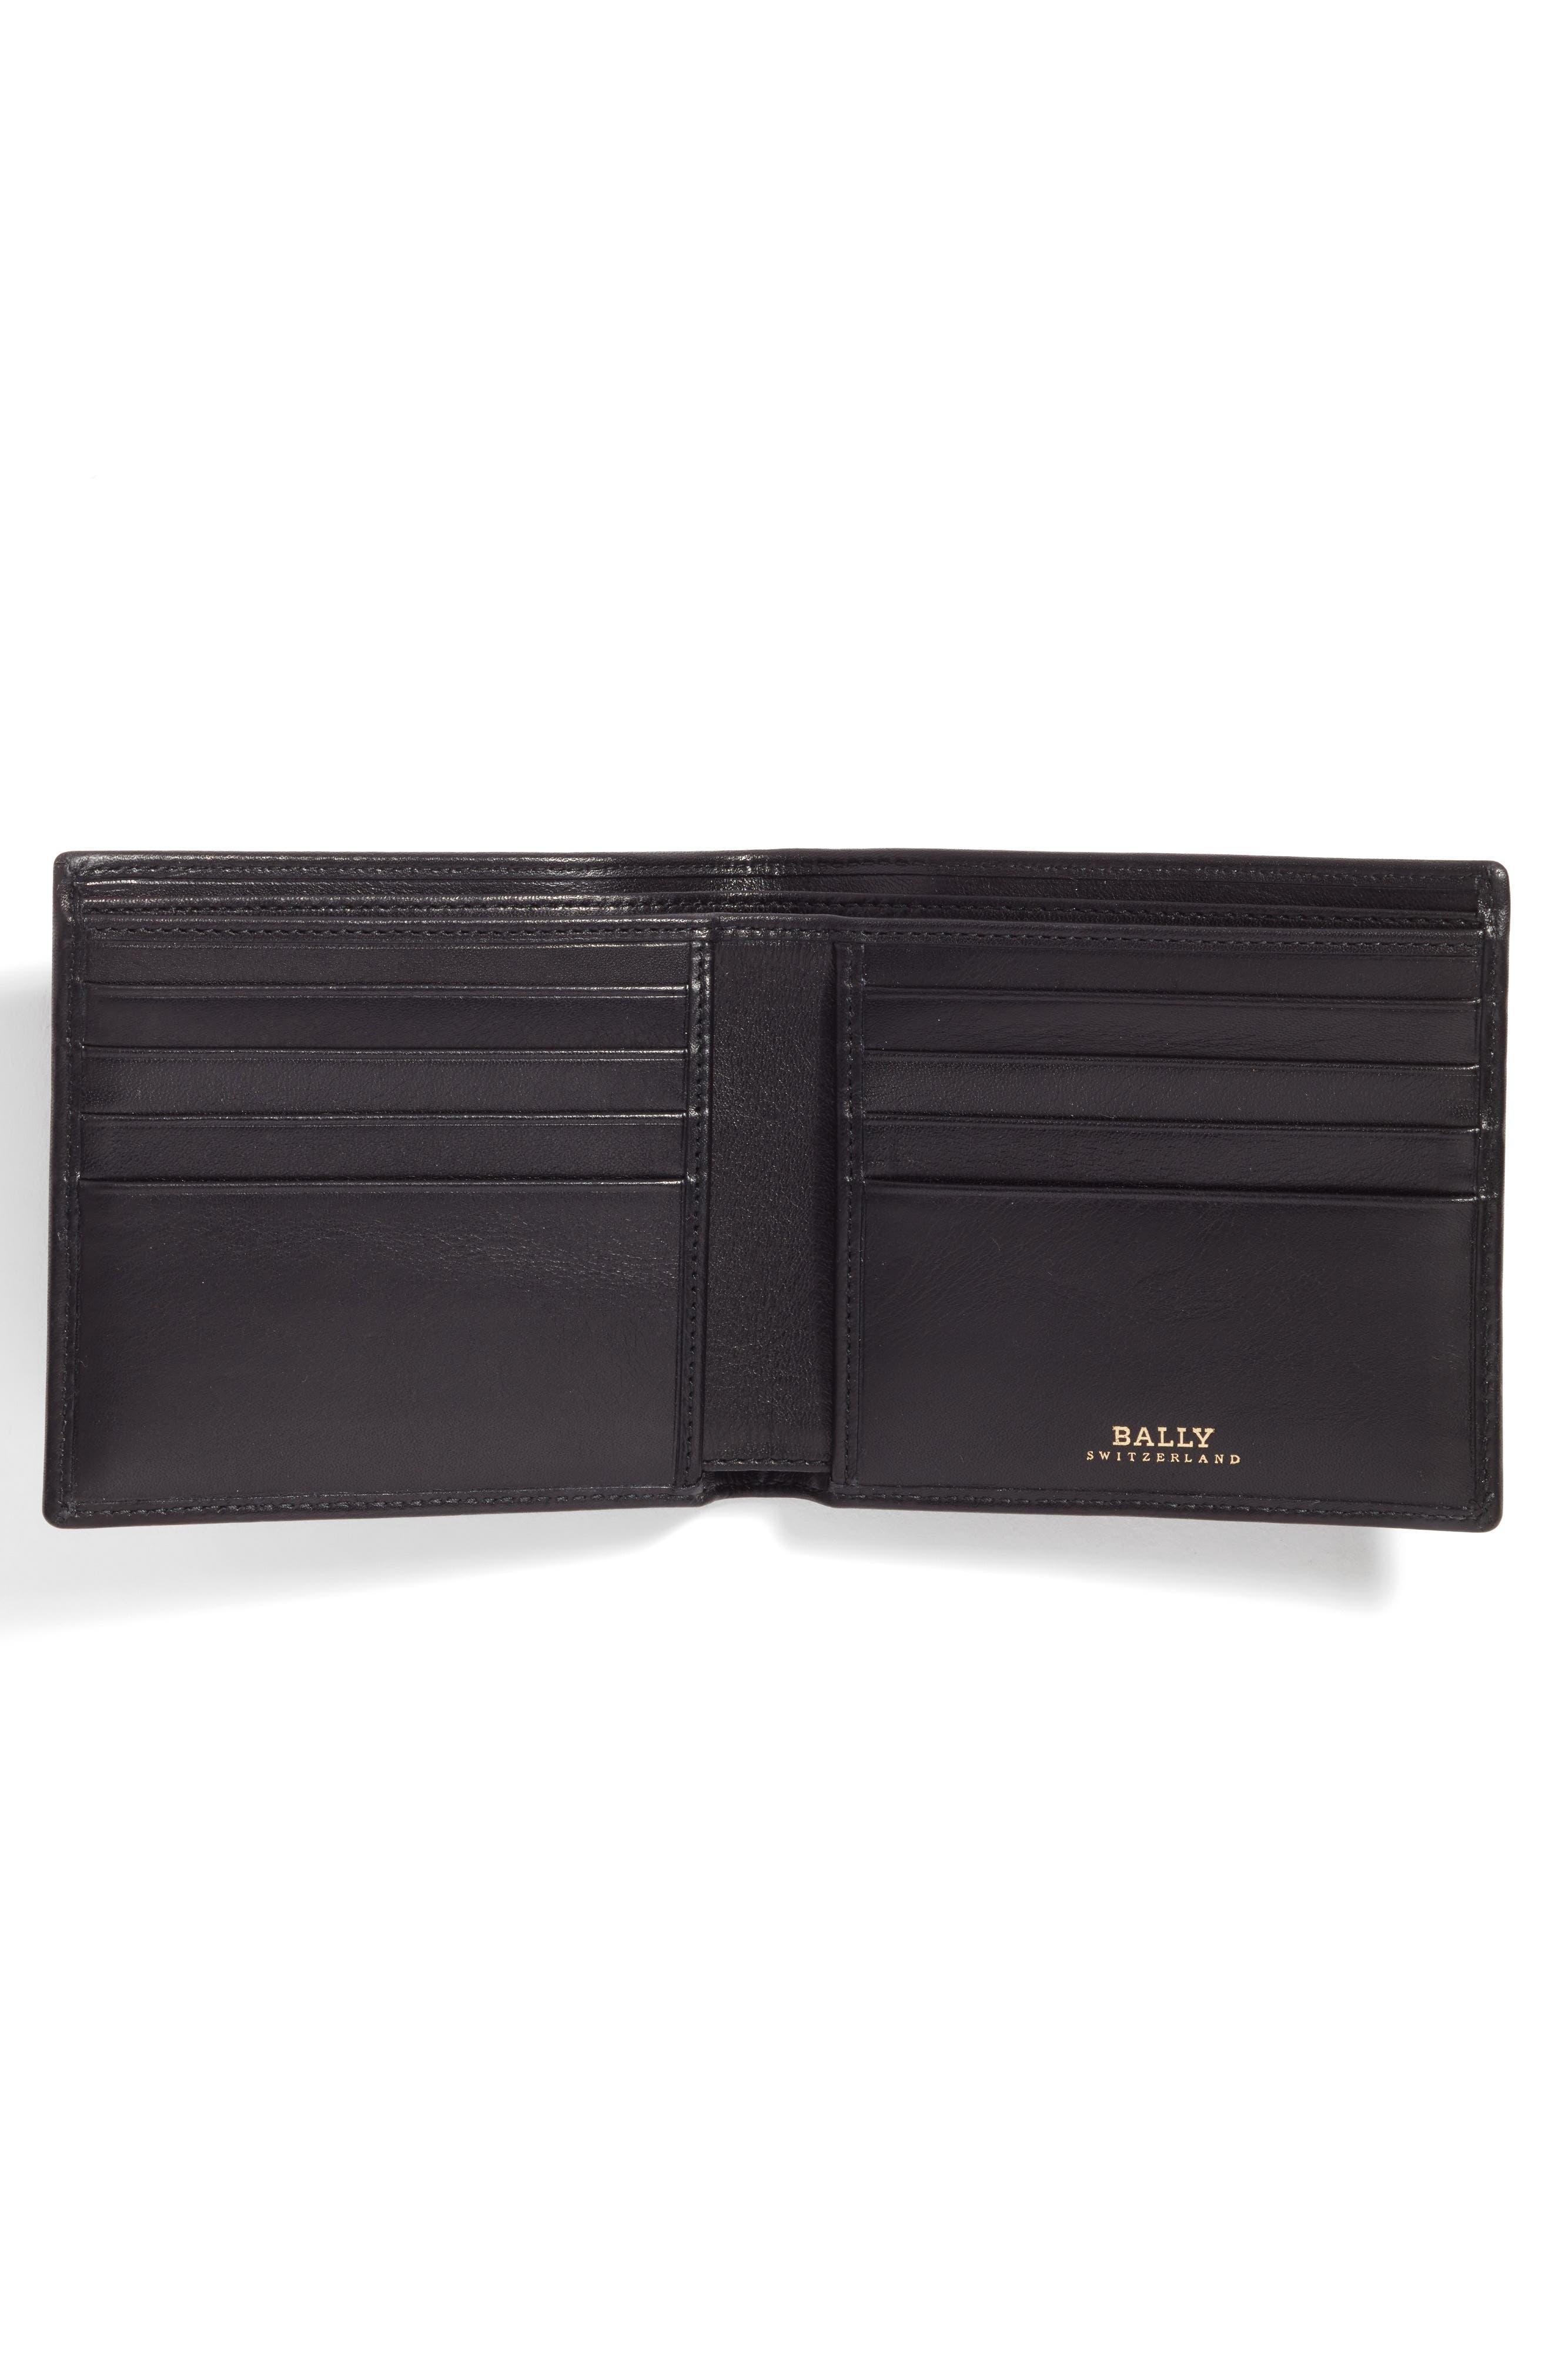 Leather Wallet and Belt Gift Set,                             Alternate thumbnail 2, color,                             Black